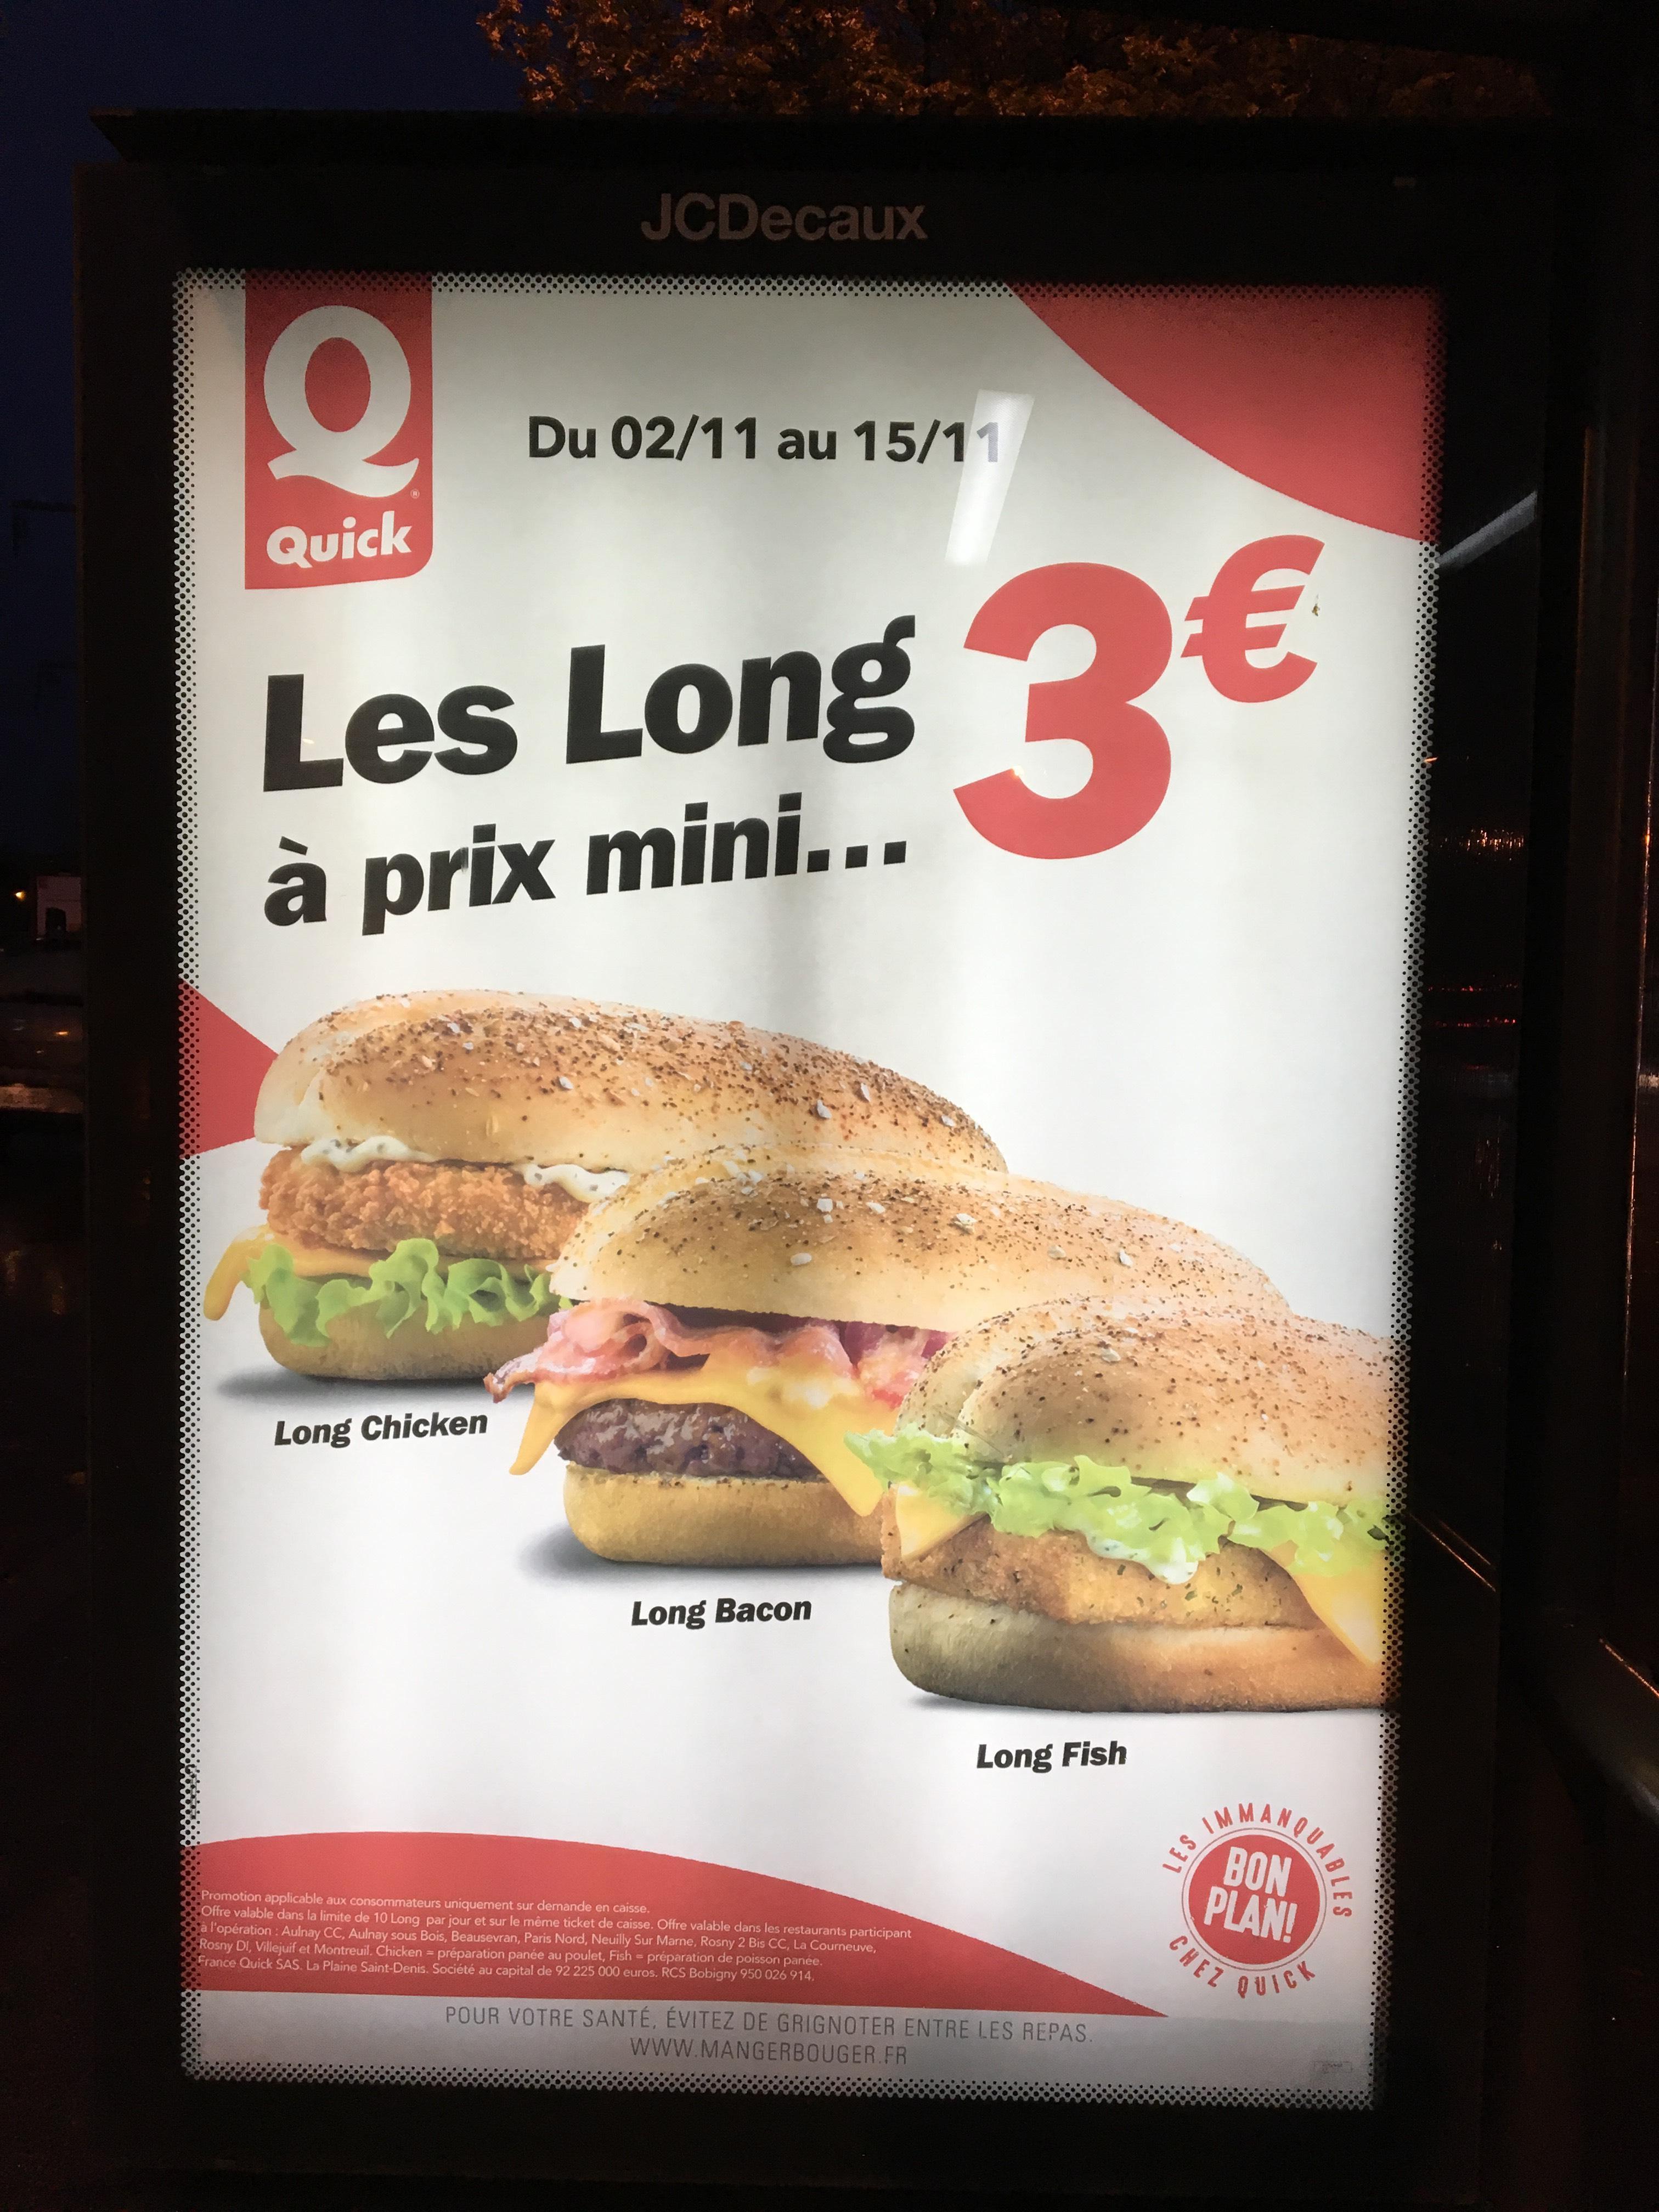 Les hamburgers Long chicken, Bacon et Fish